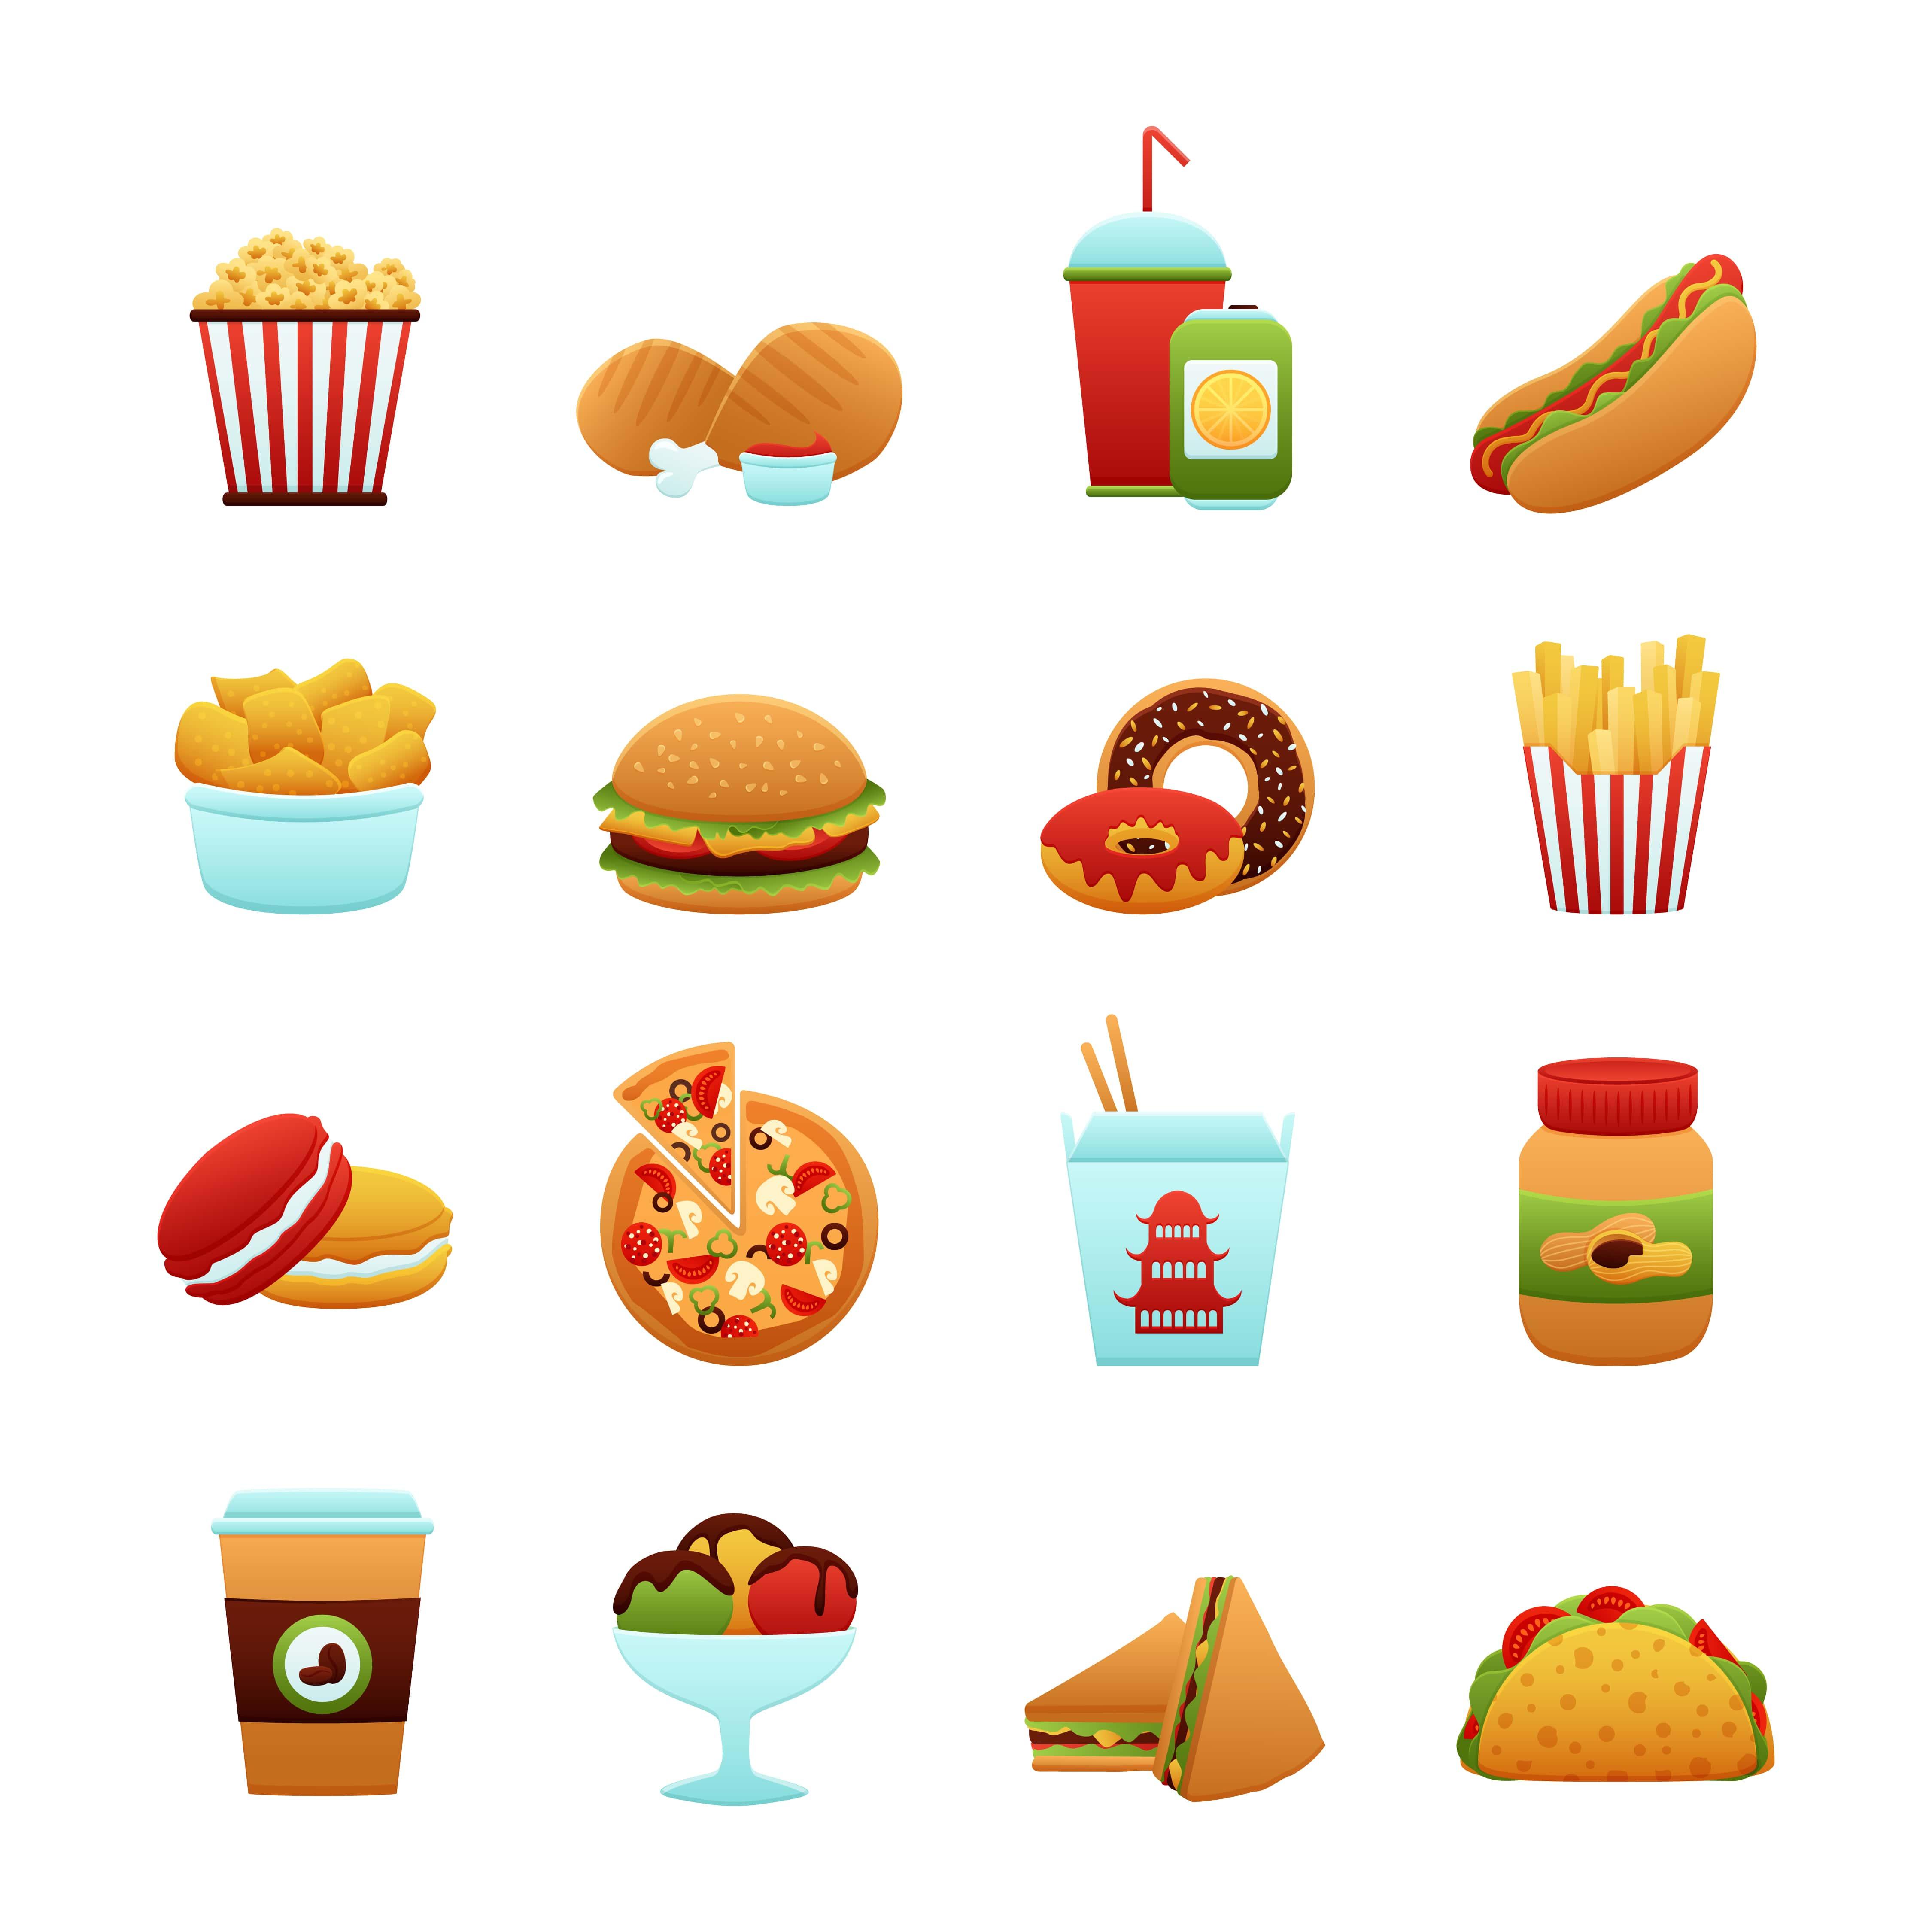 Icone_Nourriture_Fast_Food